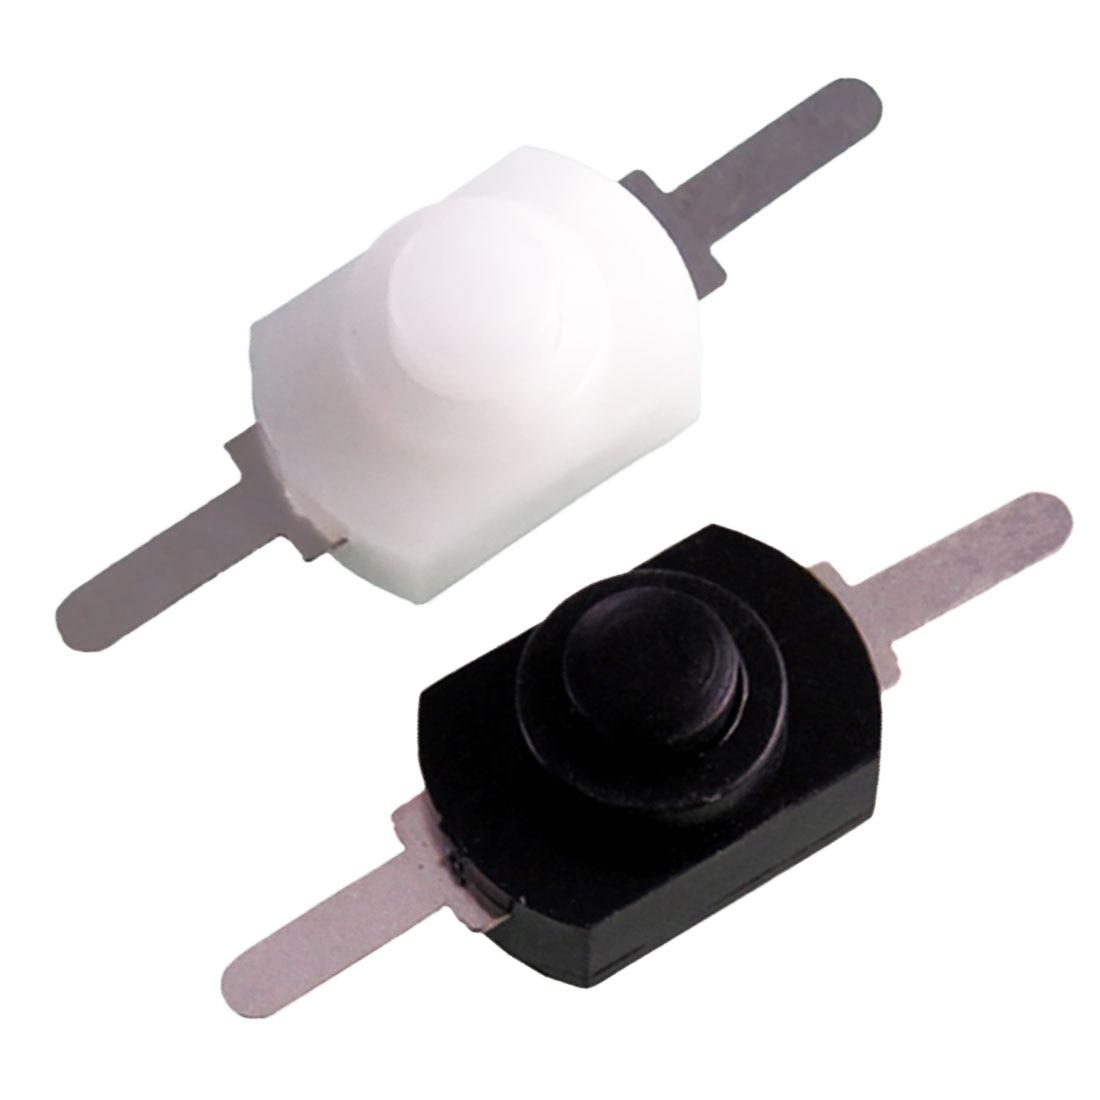 hot-sale-1pc-5pcs-10pcs1a-30v-dc-250v-white-black-latching-on-off-mini-torch-push-button-switch